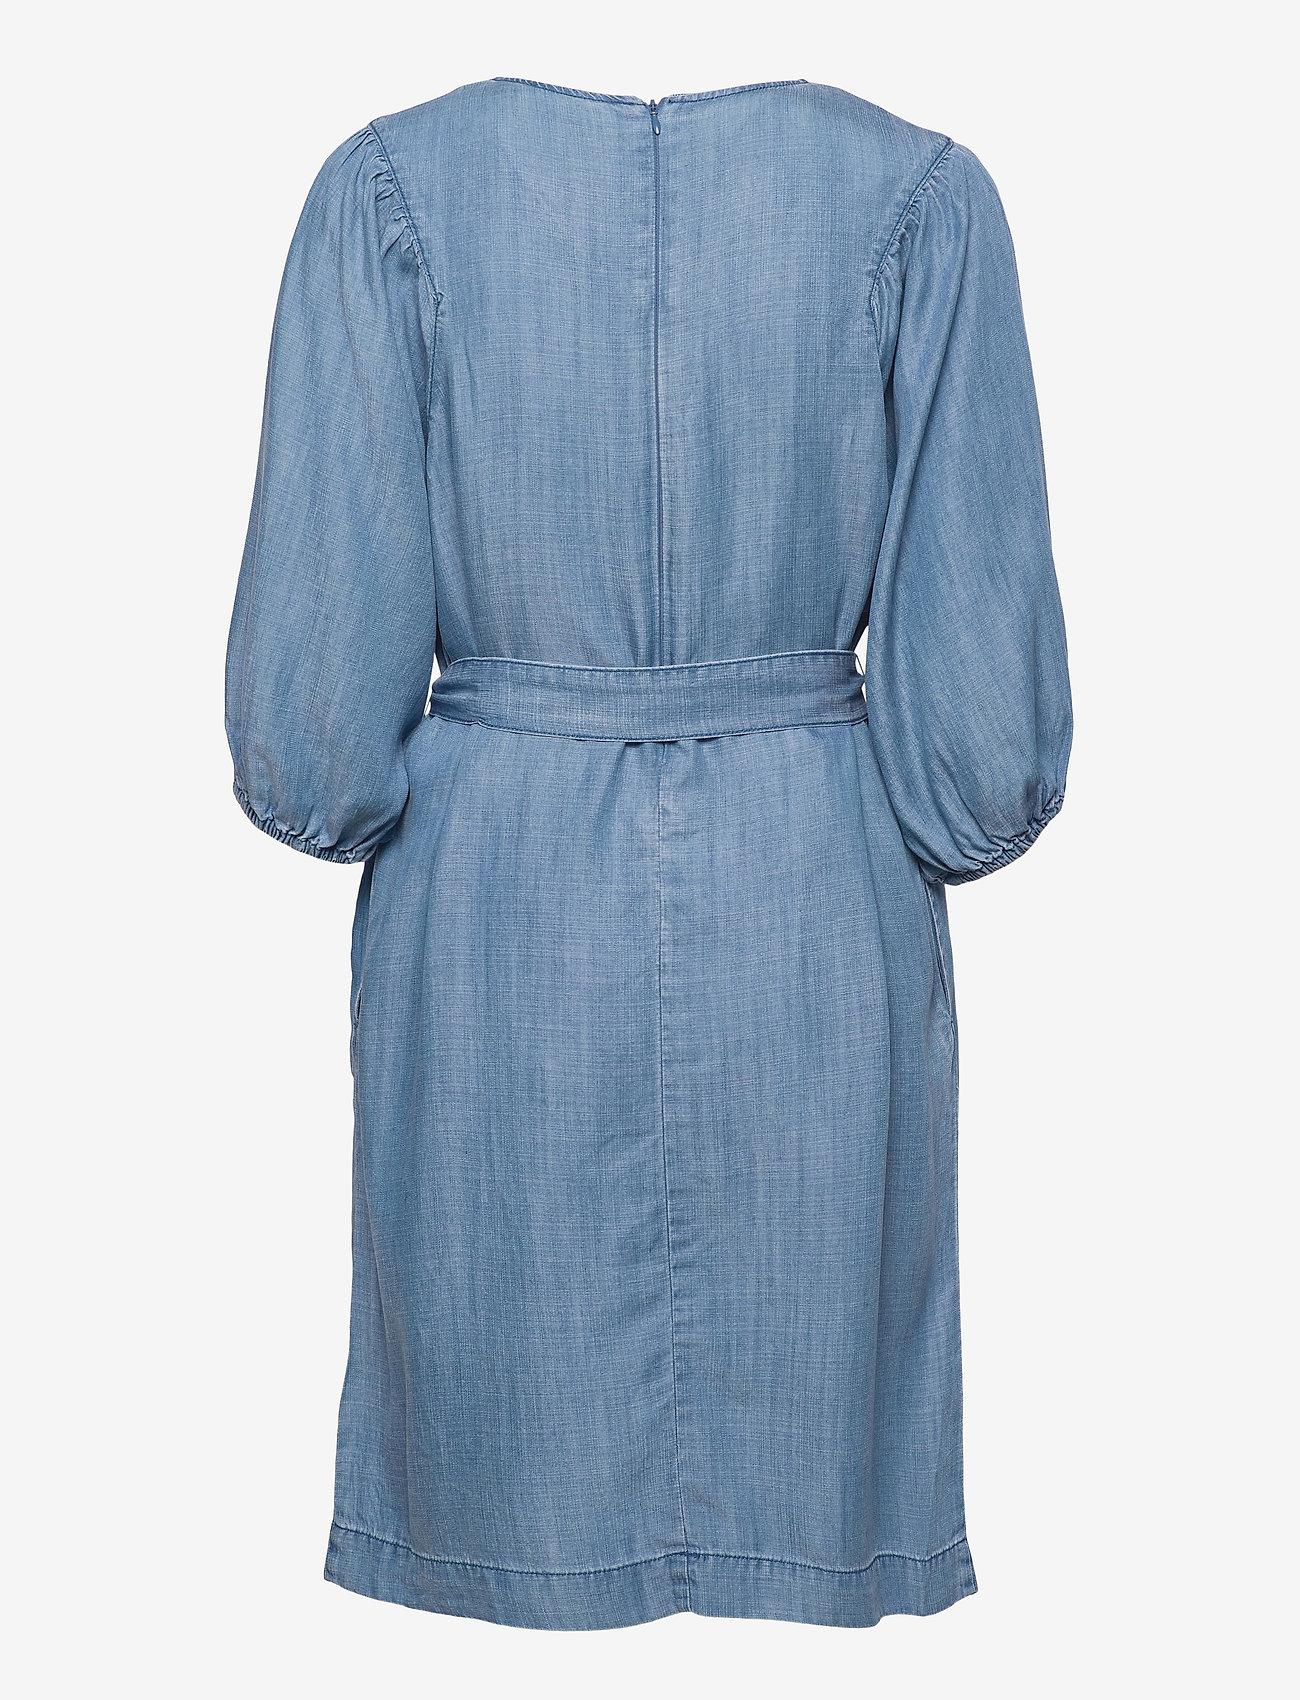 b.young - BYLANA PUFF SL DRESS - - everyday dresses - mid blue denim - 1